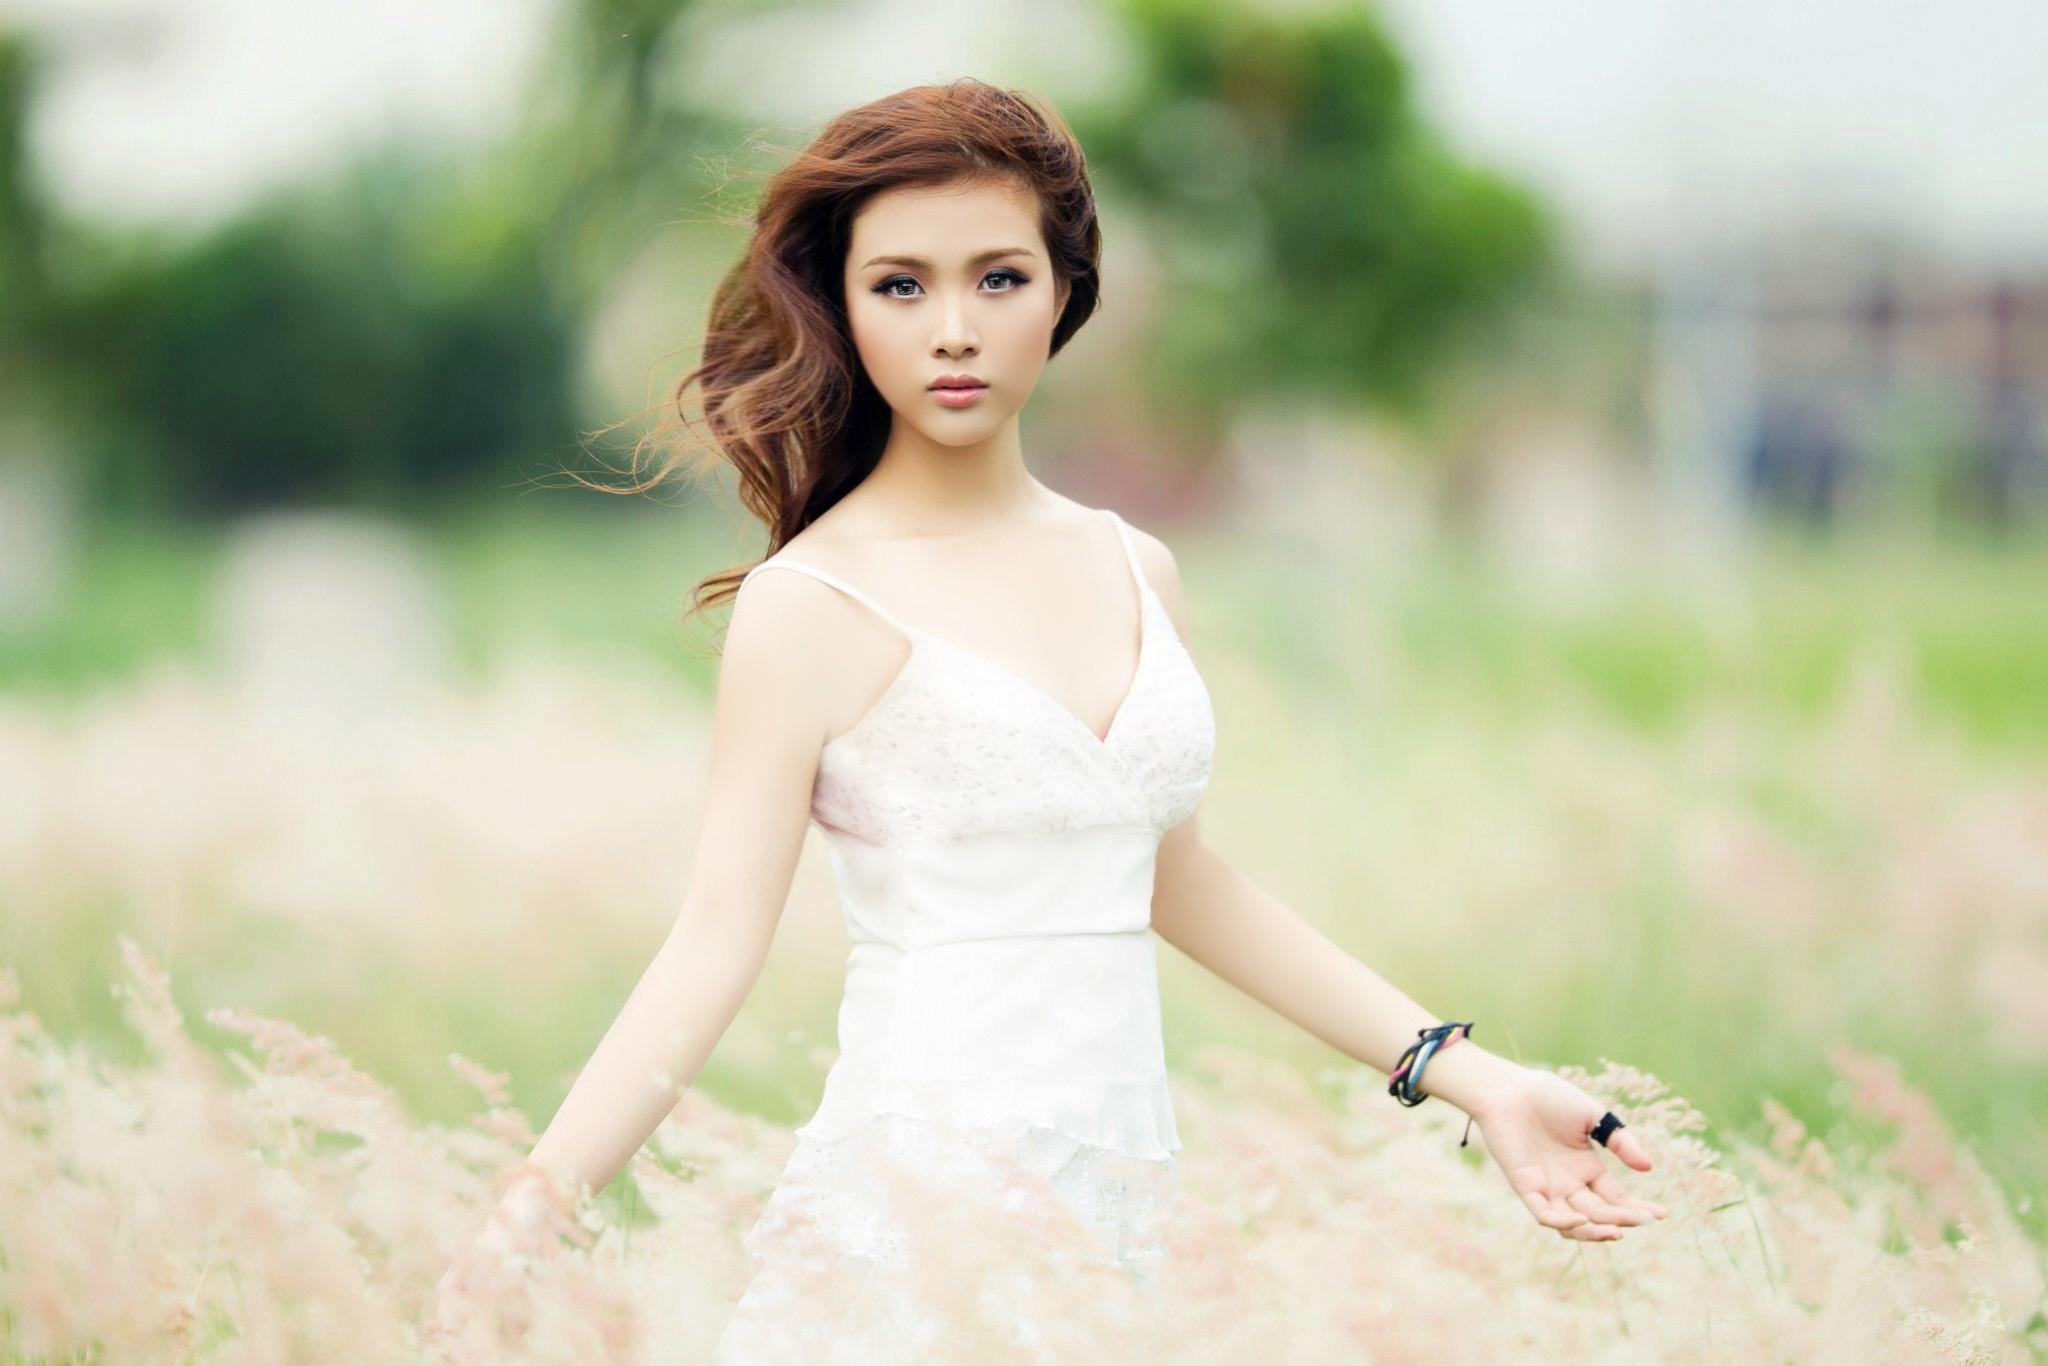 beautiful-pictures-up-girls-dresses-christie-hendricks-nude